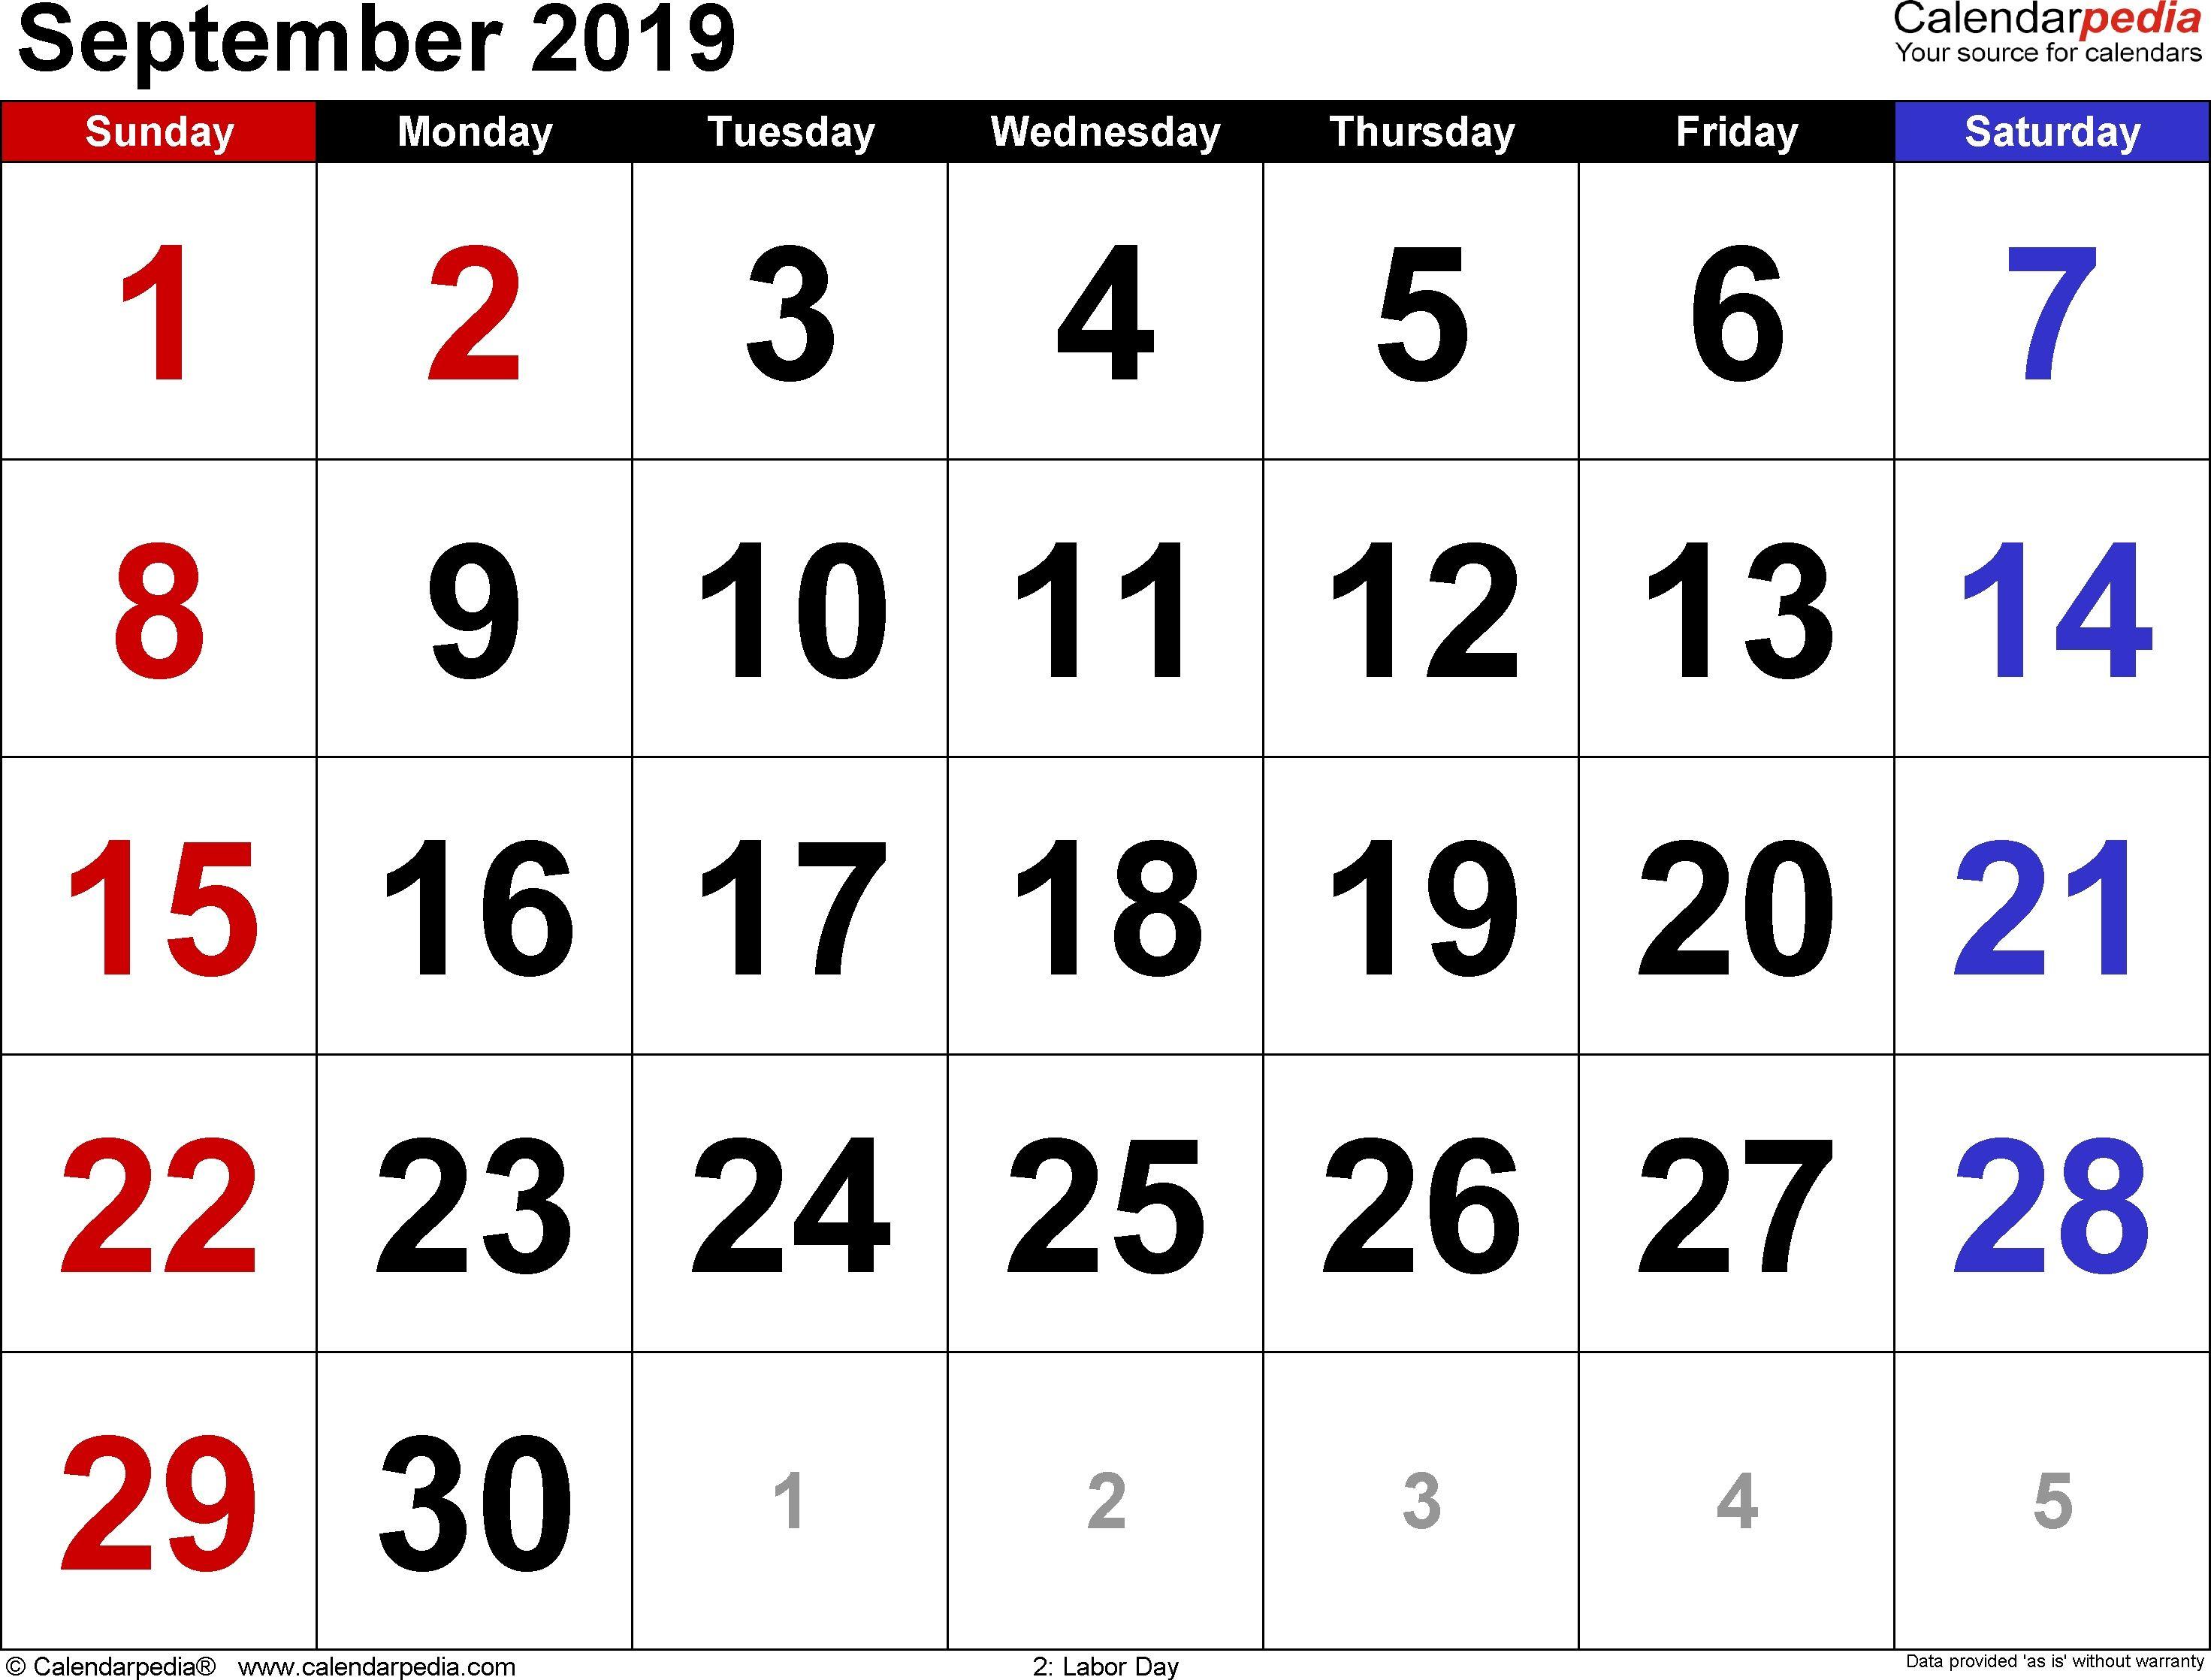 September 2019 Calendars For Word Excel Pdf Dowload June 2019